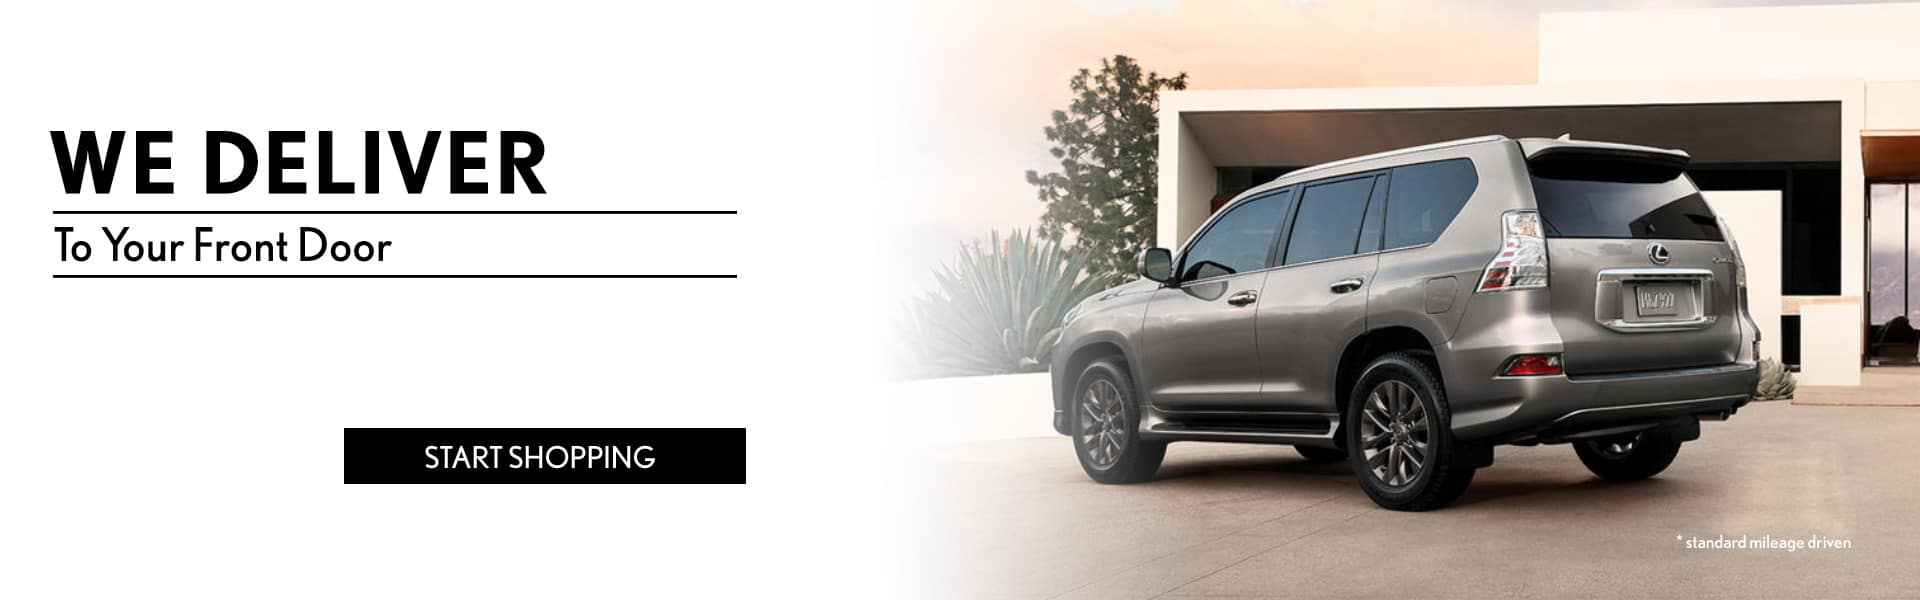 Lexus Home Delivery